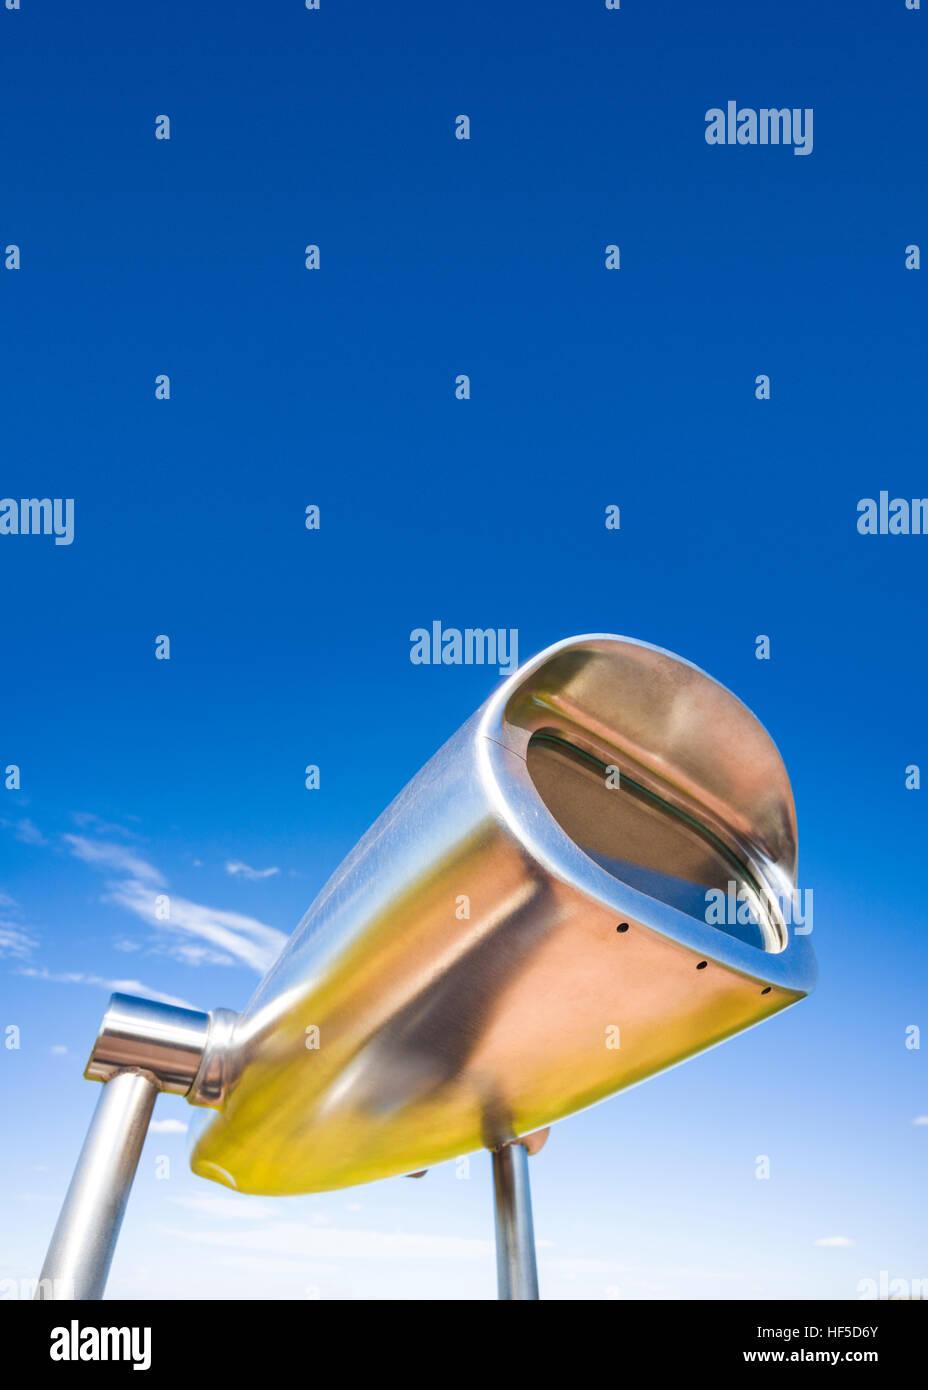 Fernglas Hi-Spy Münz Betrachtung Bereiche, Teleskope. Stockbild